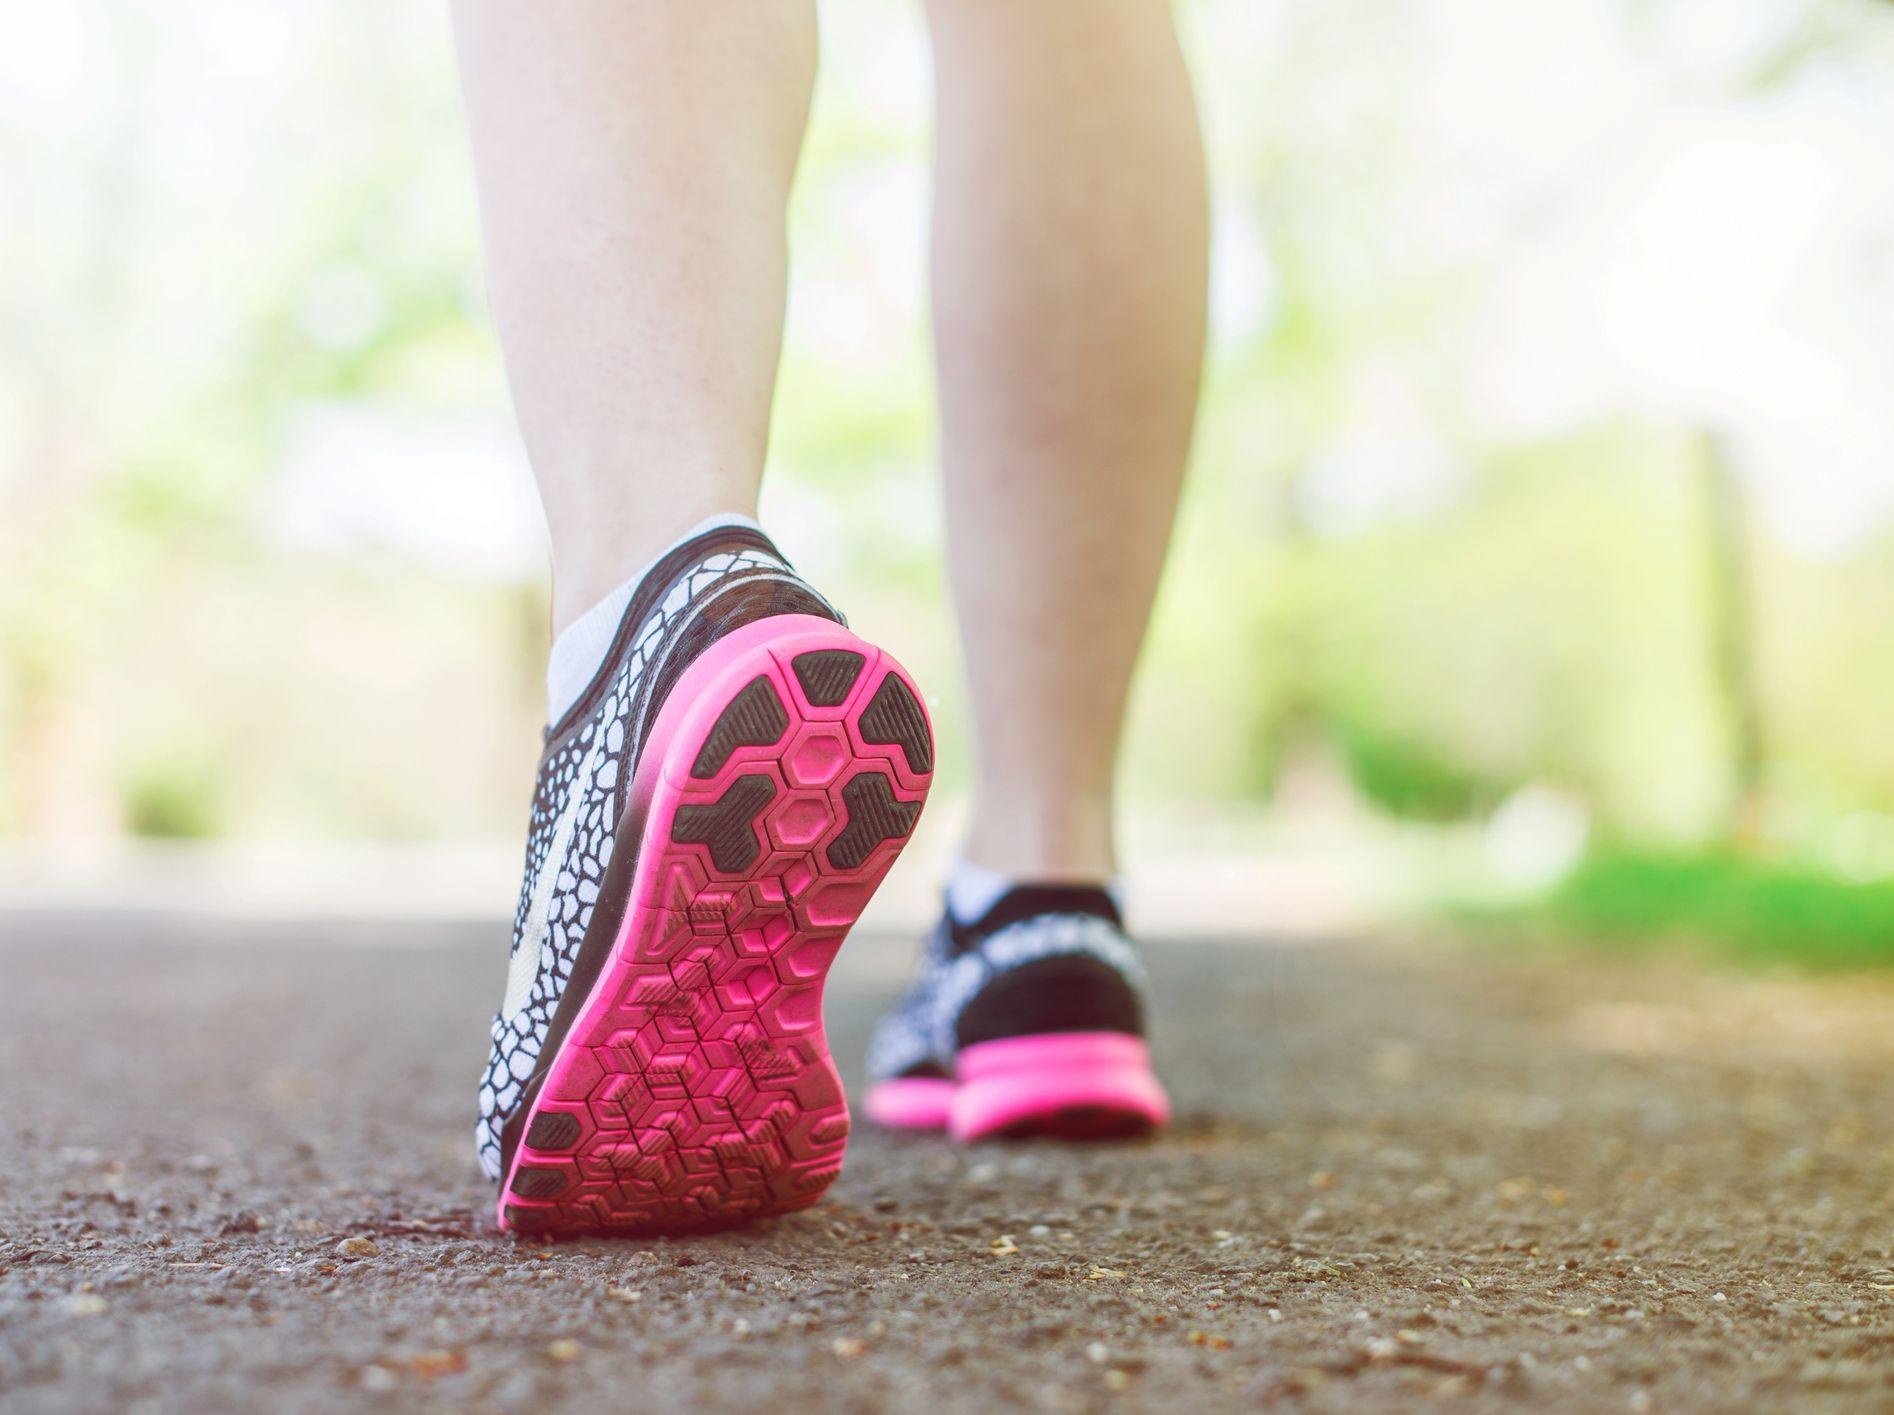 13 Best Walking Shoes for Women to Buy in 2019